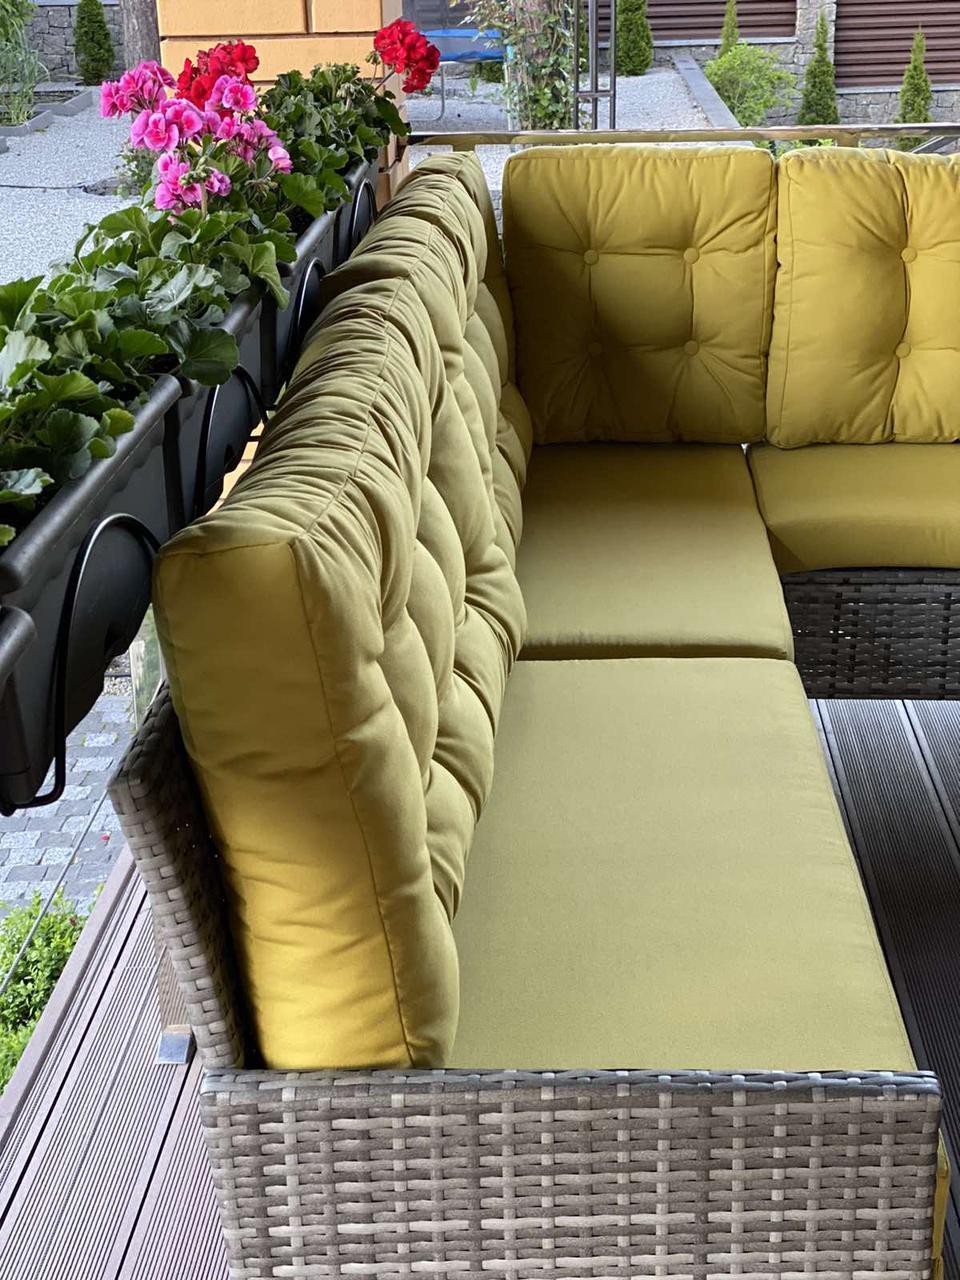 Мягкие подушки с декоративными пуговицами для дивана